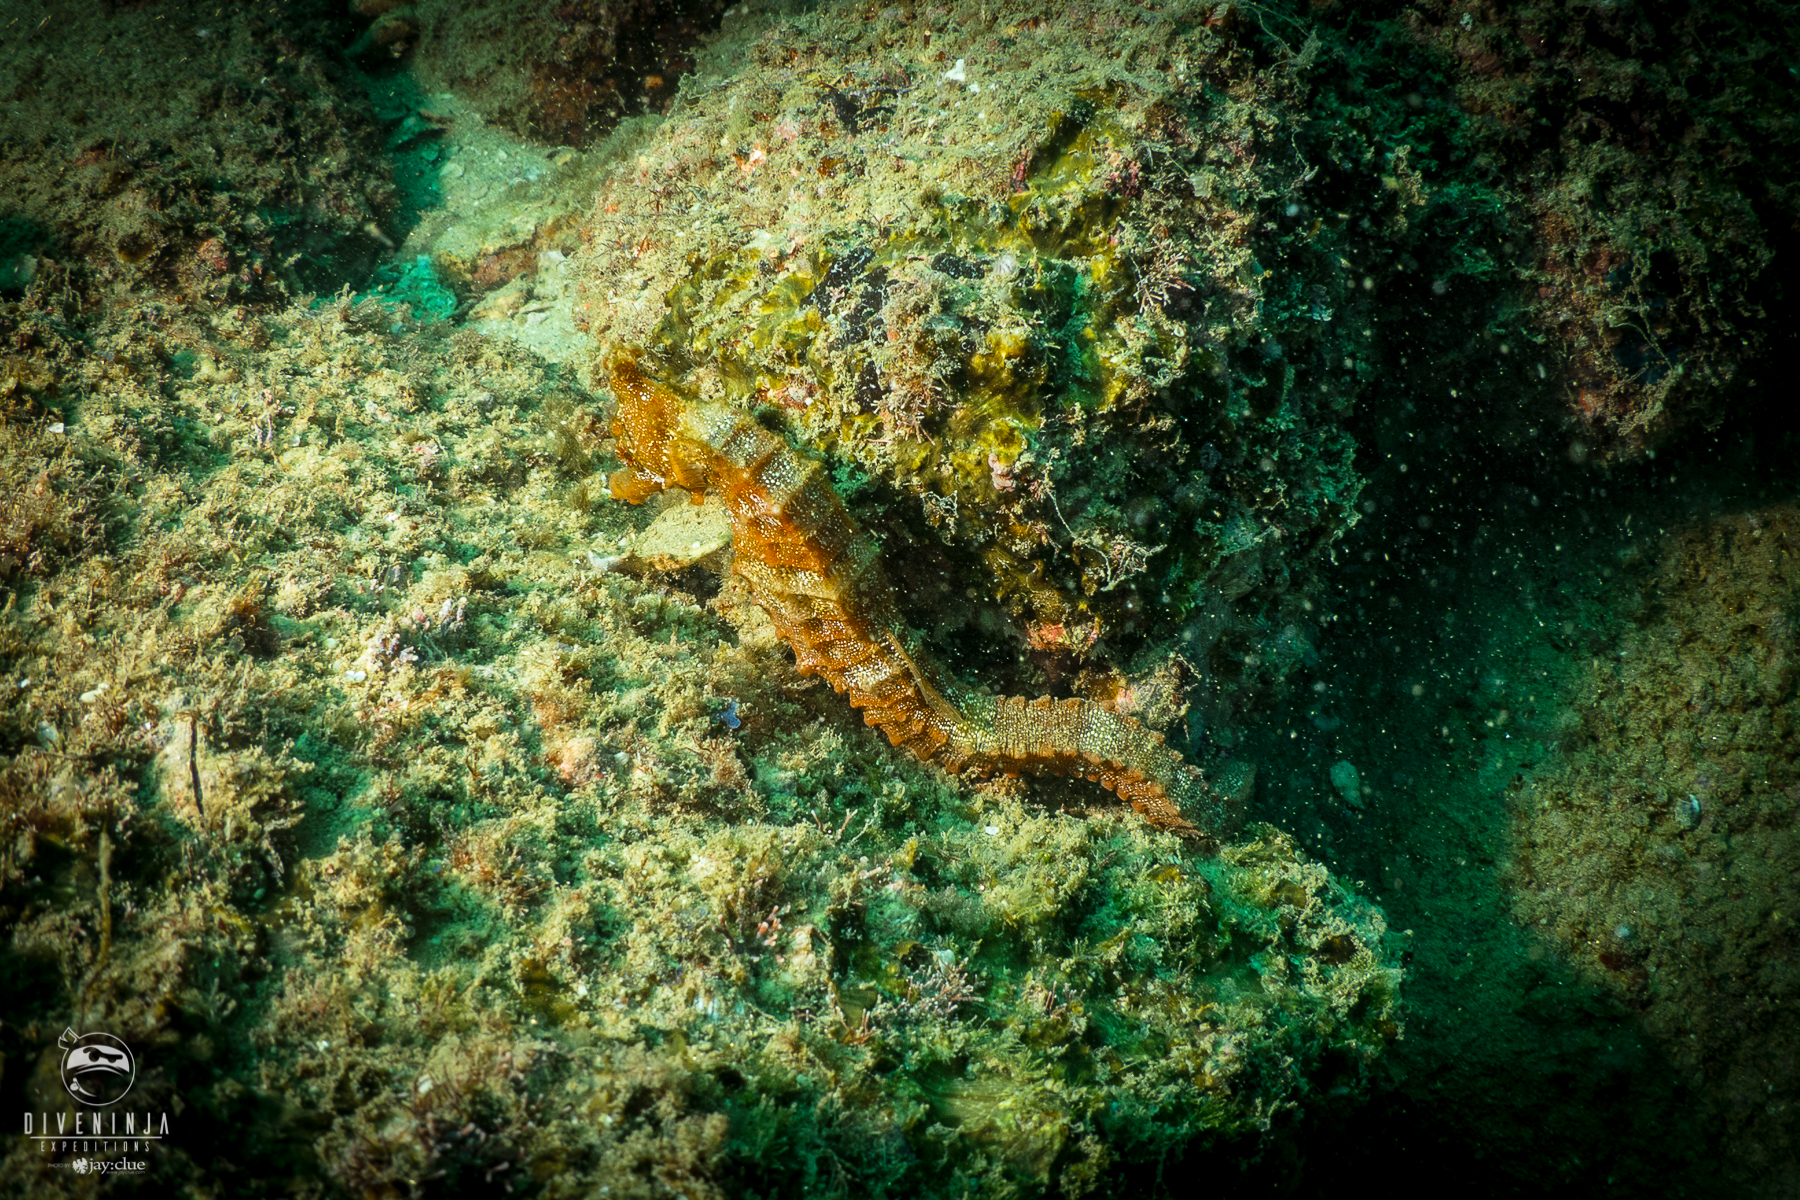 seahorse PADI Women's Dive Day 2018. Cabo San Lucas Mexico